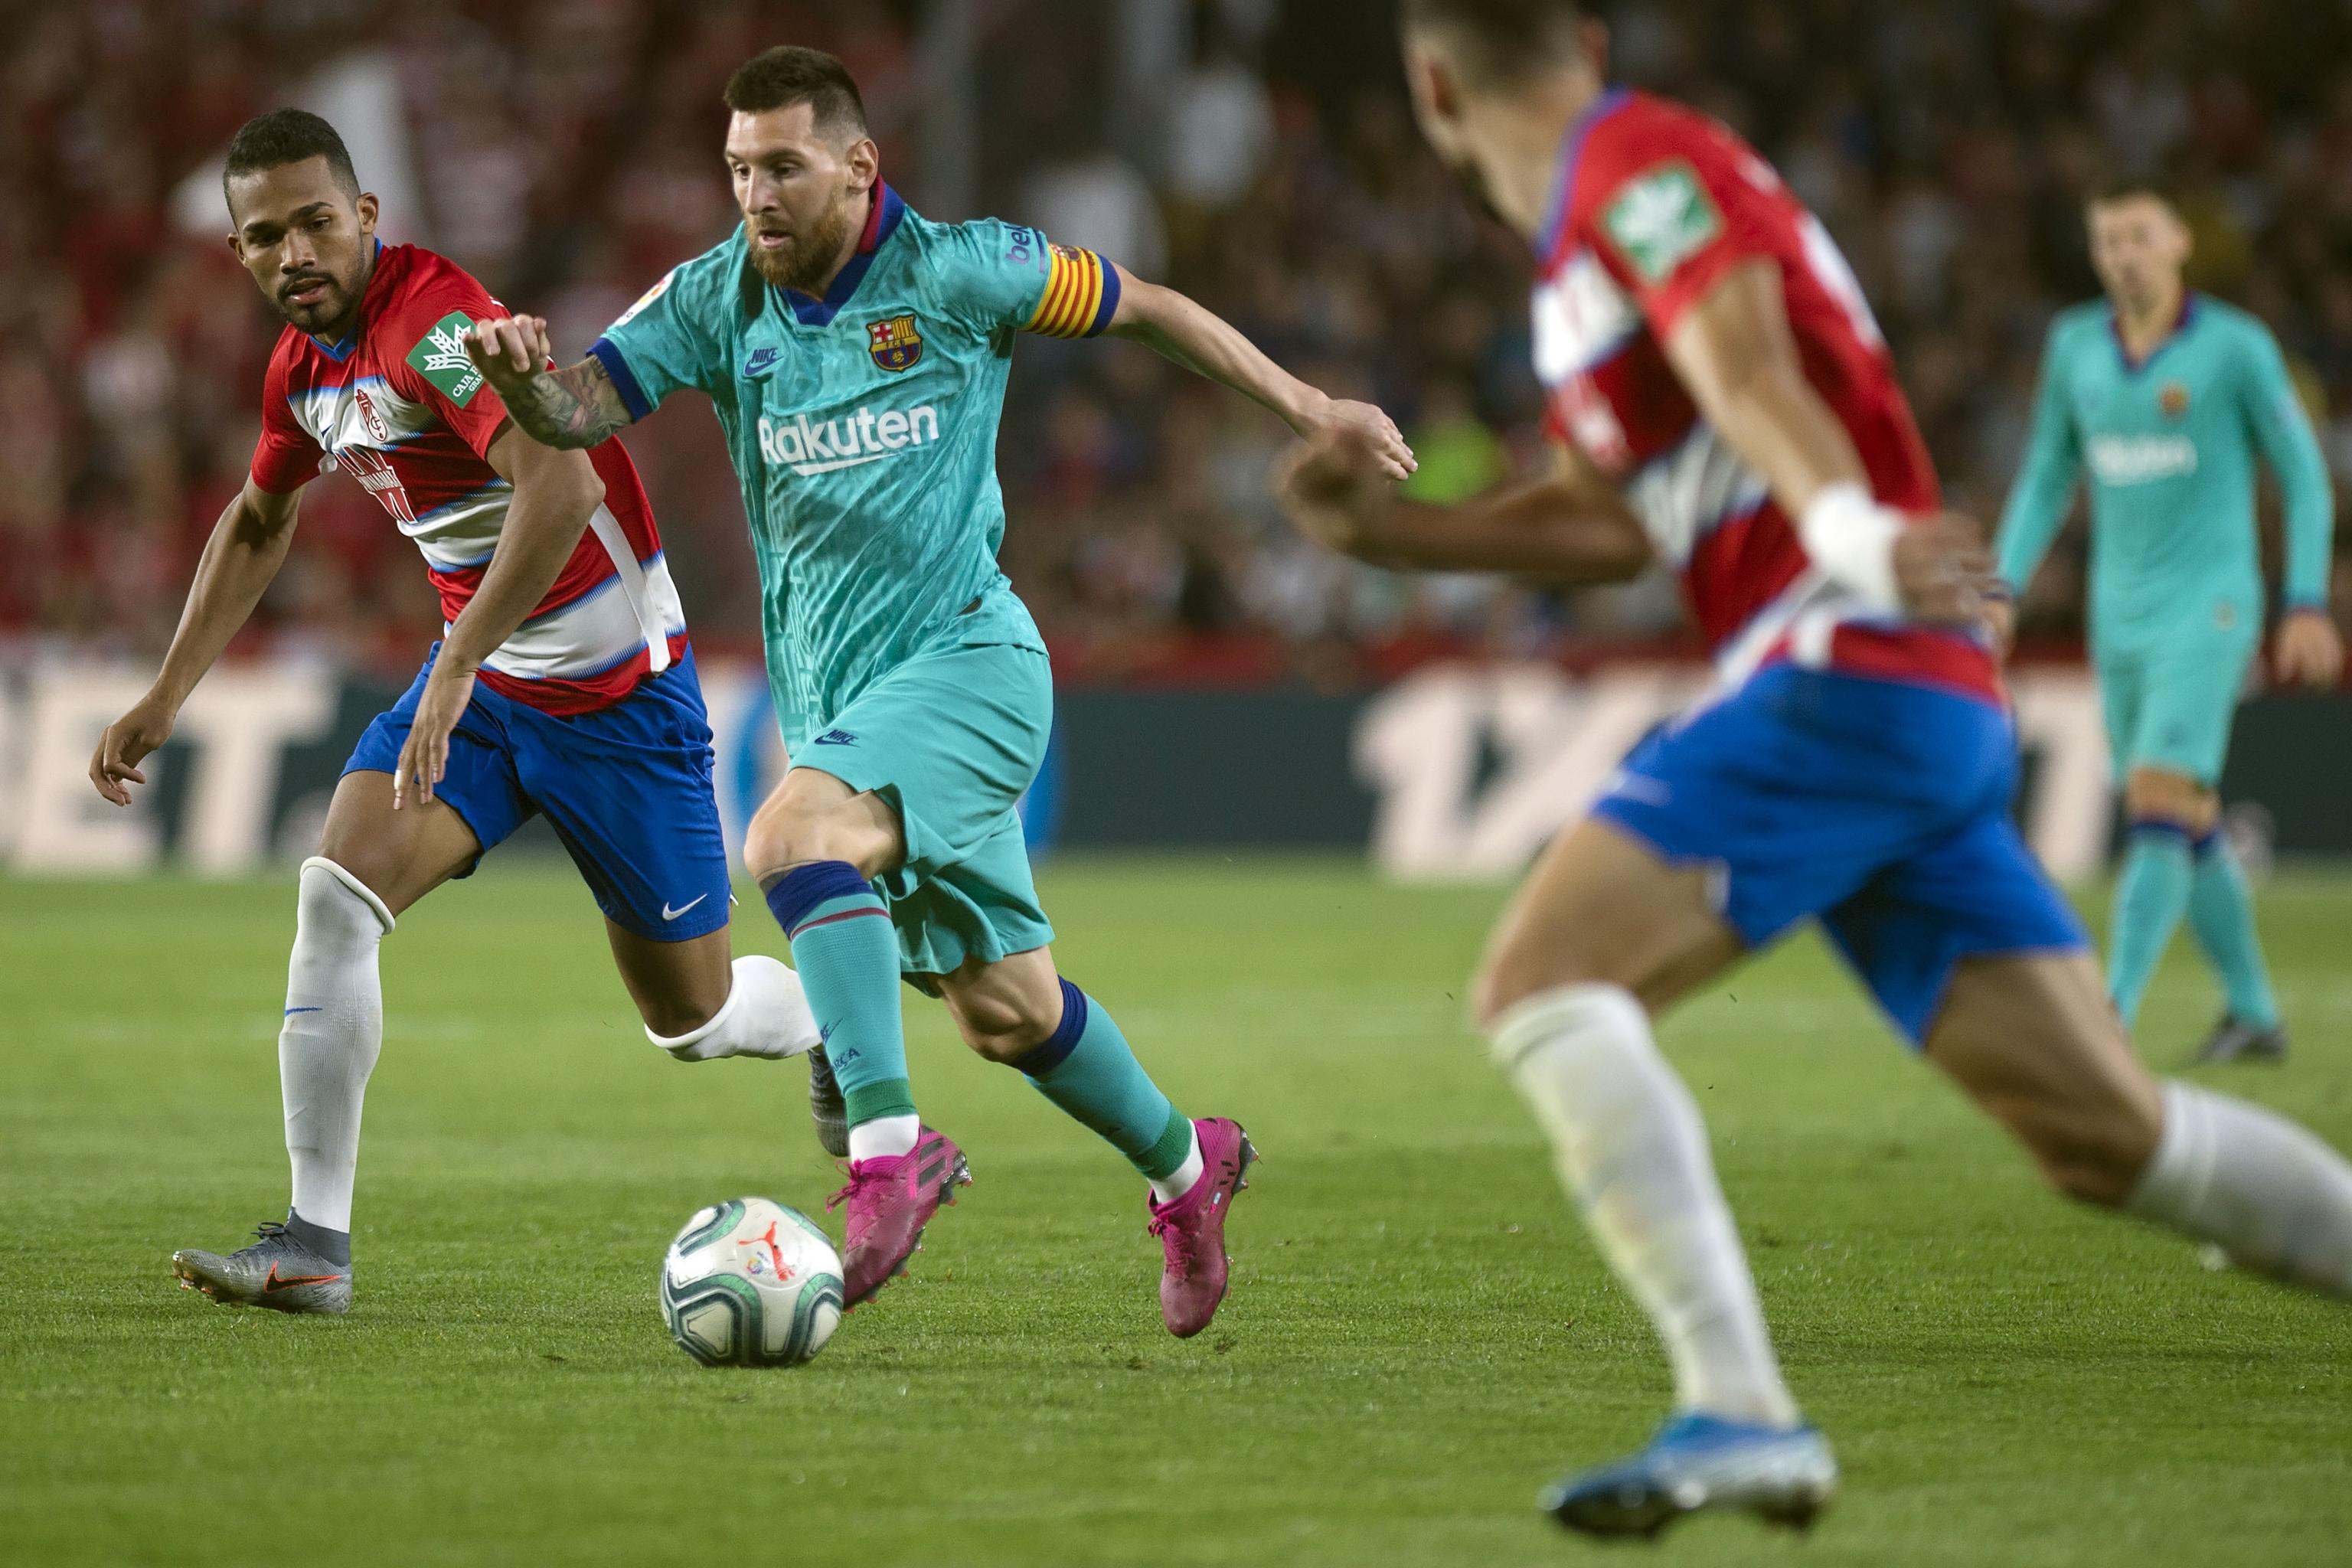 Lionel Messi Barcelona Stunned 2 0 By Granada In La Liga Bleacher Report Latest News Videos And Highlights